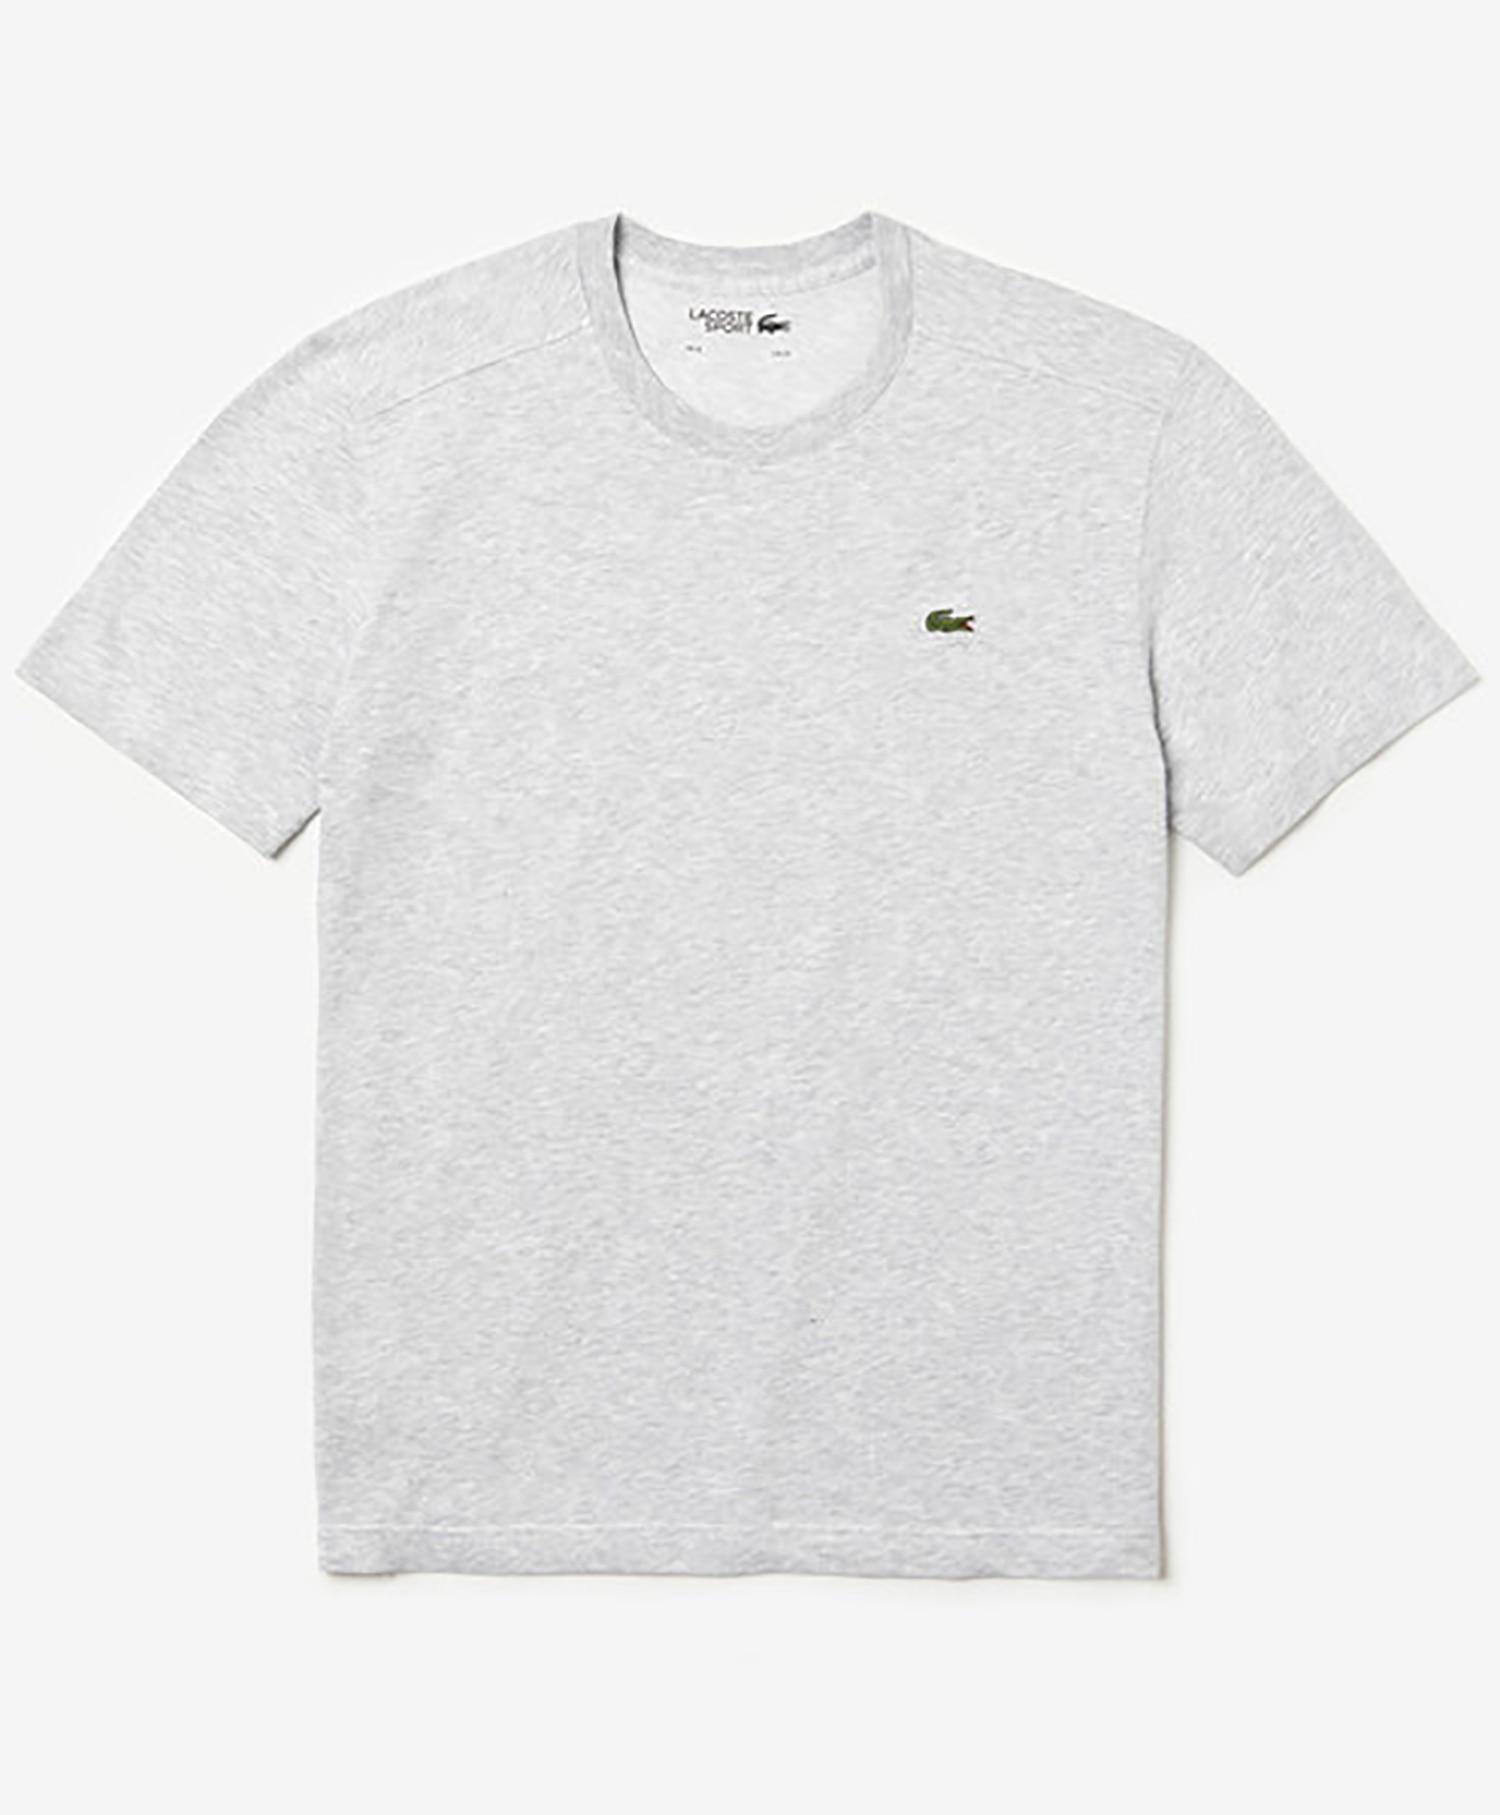 Lacoste Tee-shirt